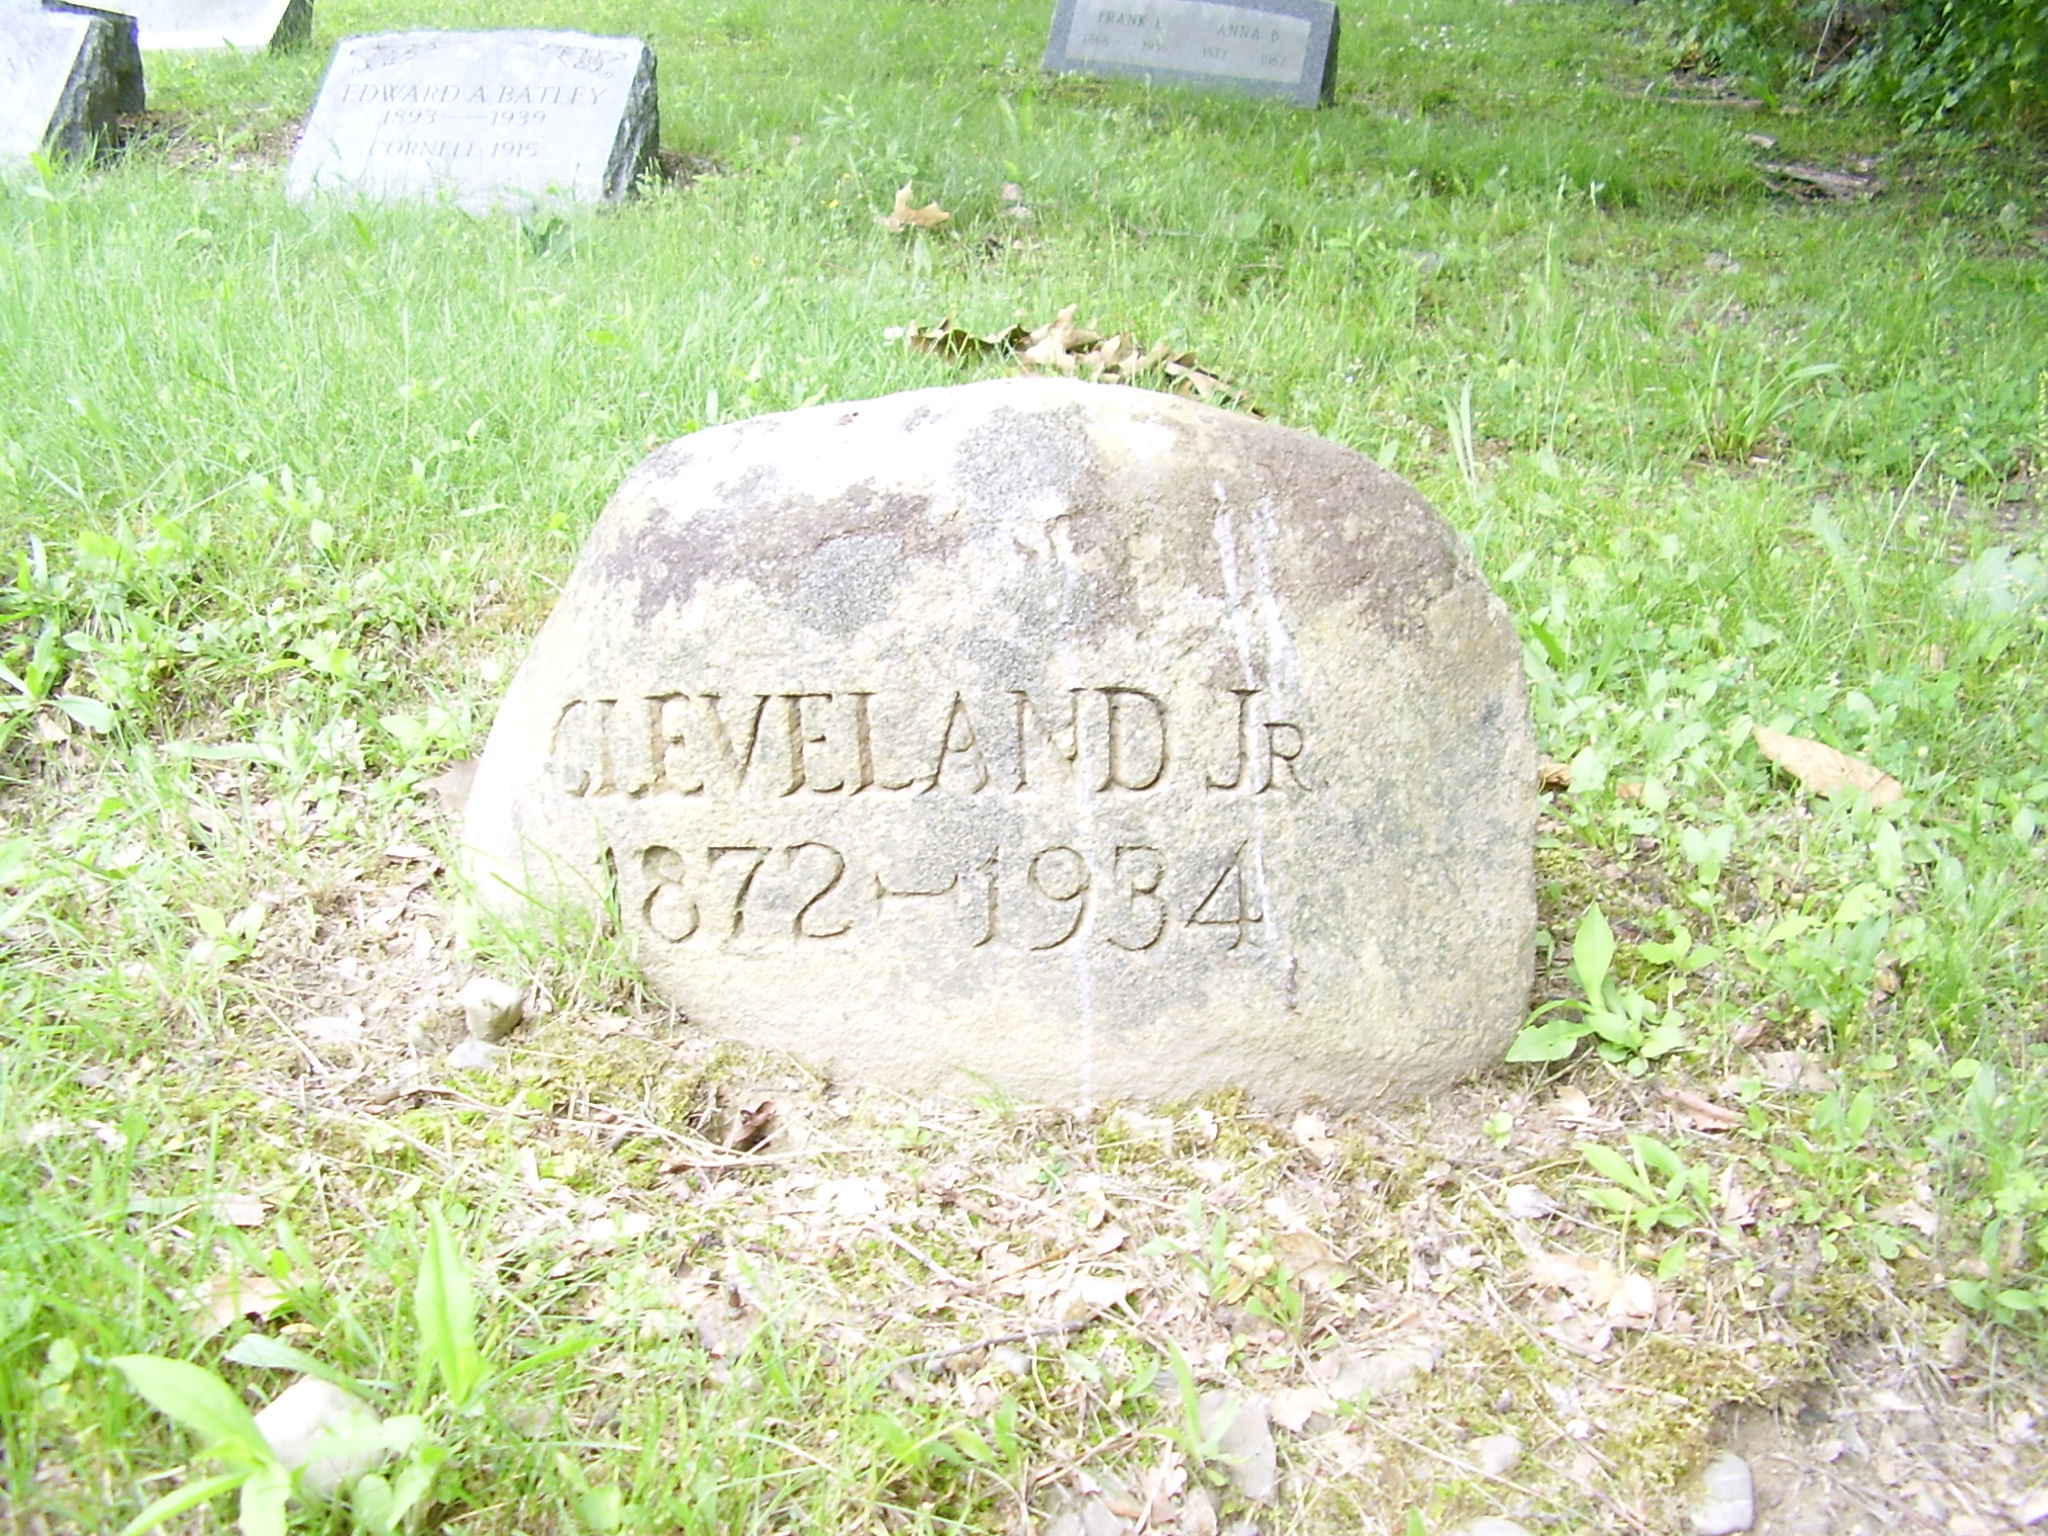 Cleveland Abbe, Jr